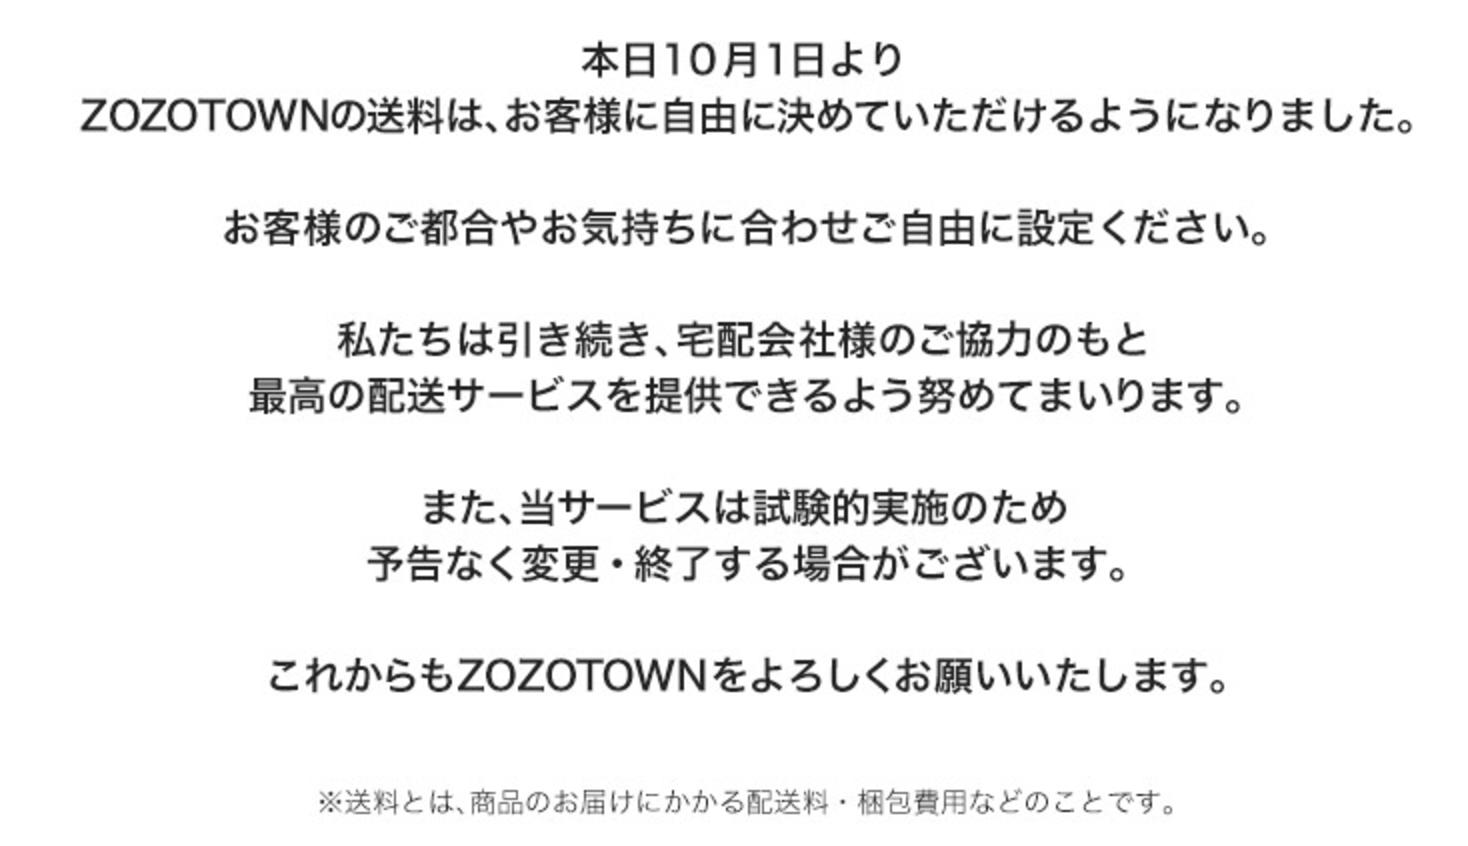 【Pick Up! Vol.37】〜ZOZOTOWNの『送料自由』体験レポート〜